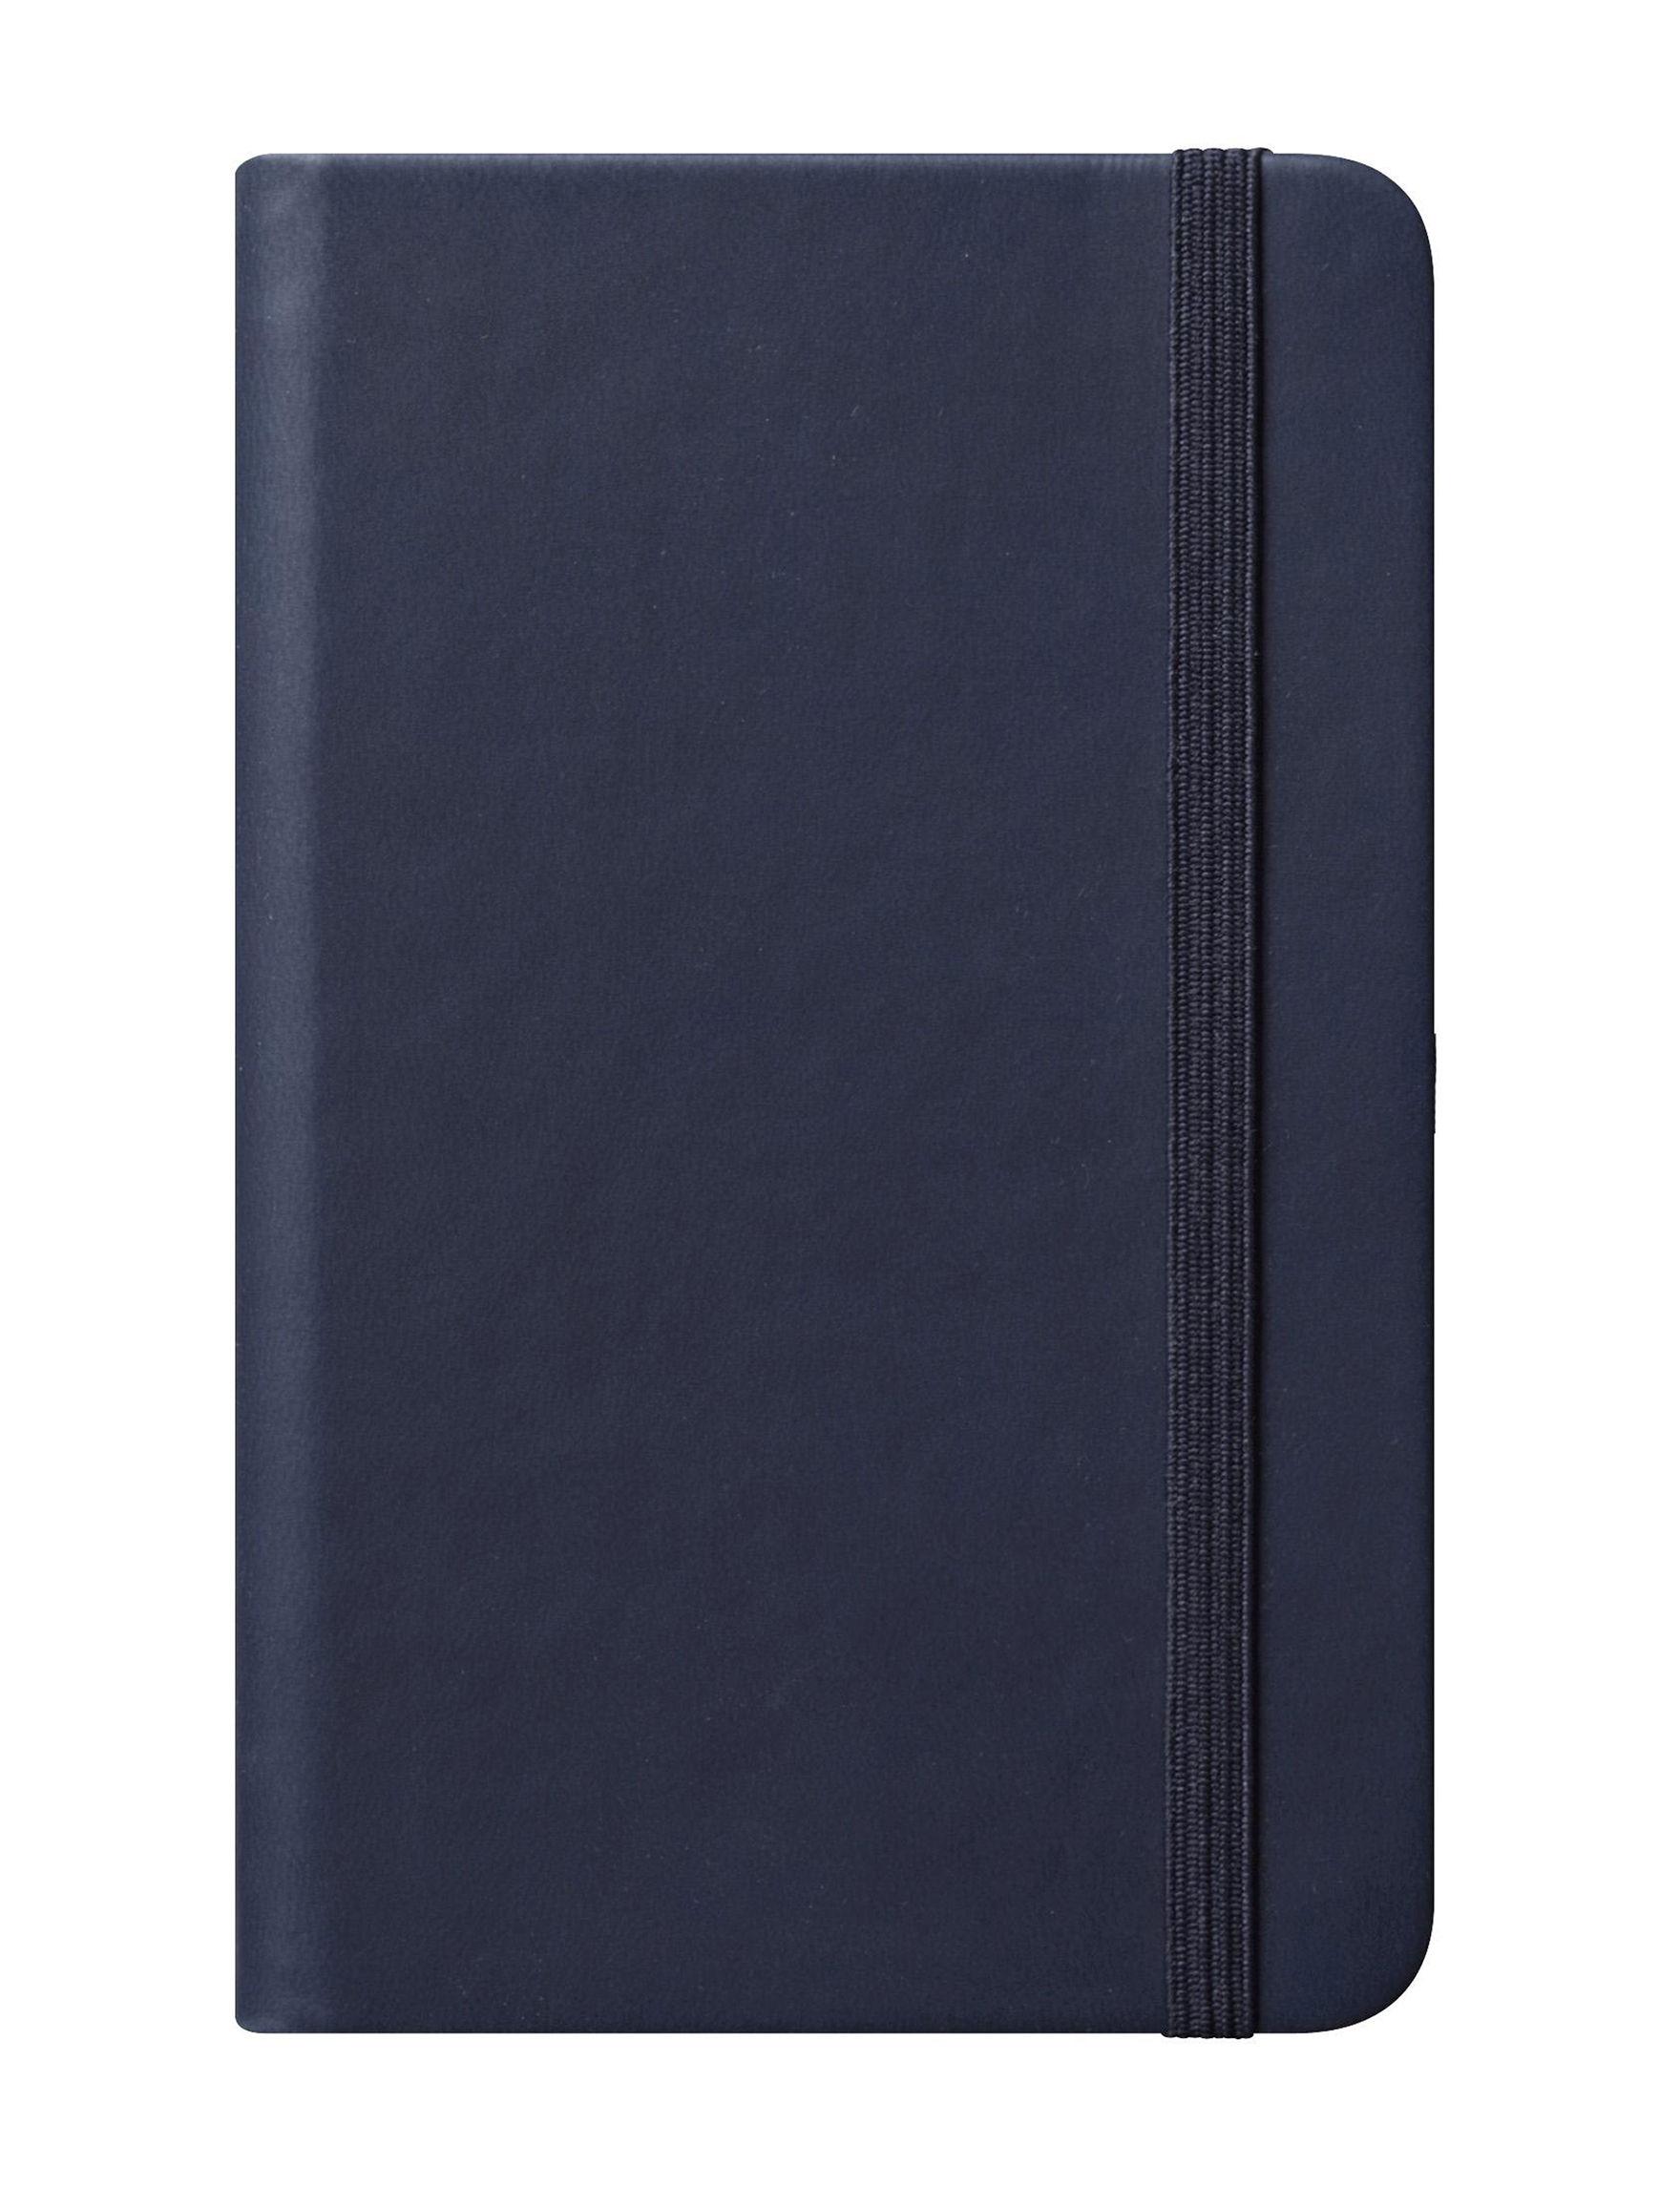 Eccolo Navy Journals & Notepads School & Office Supplies